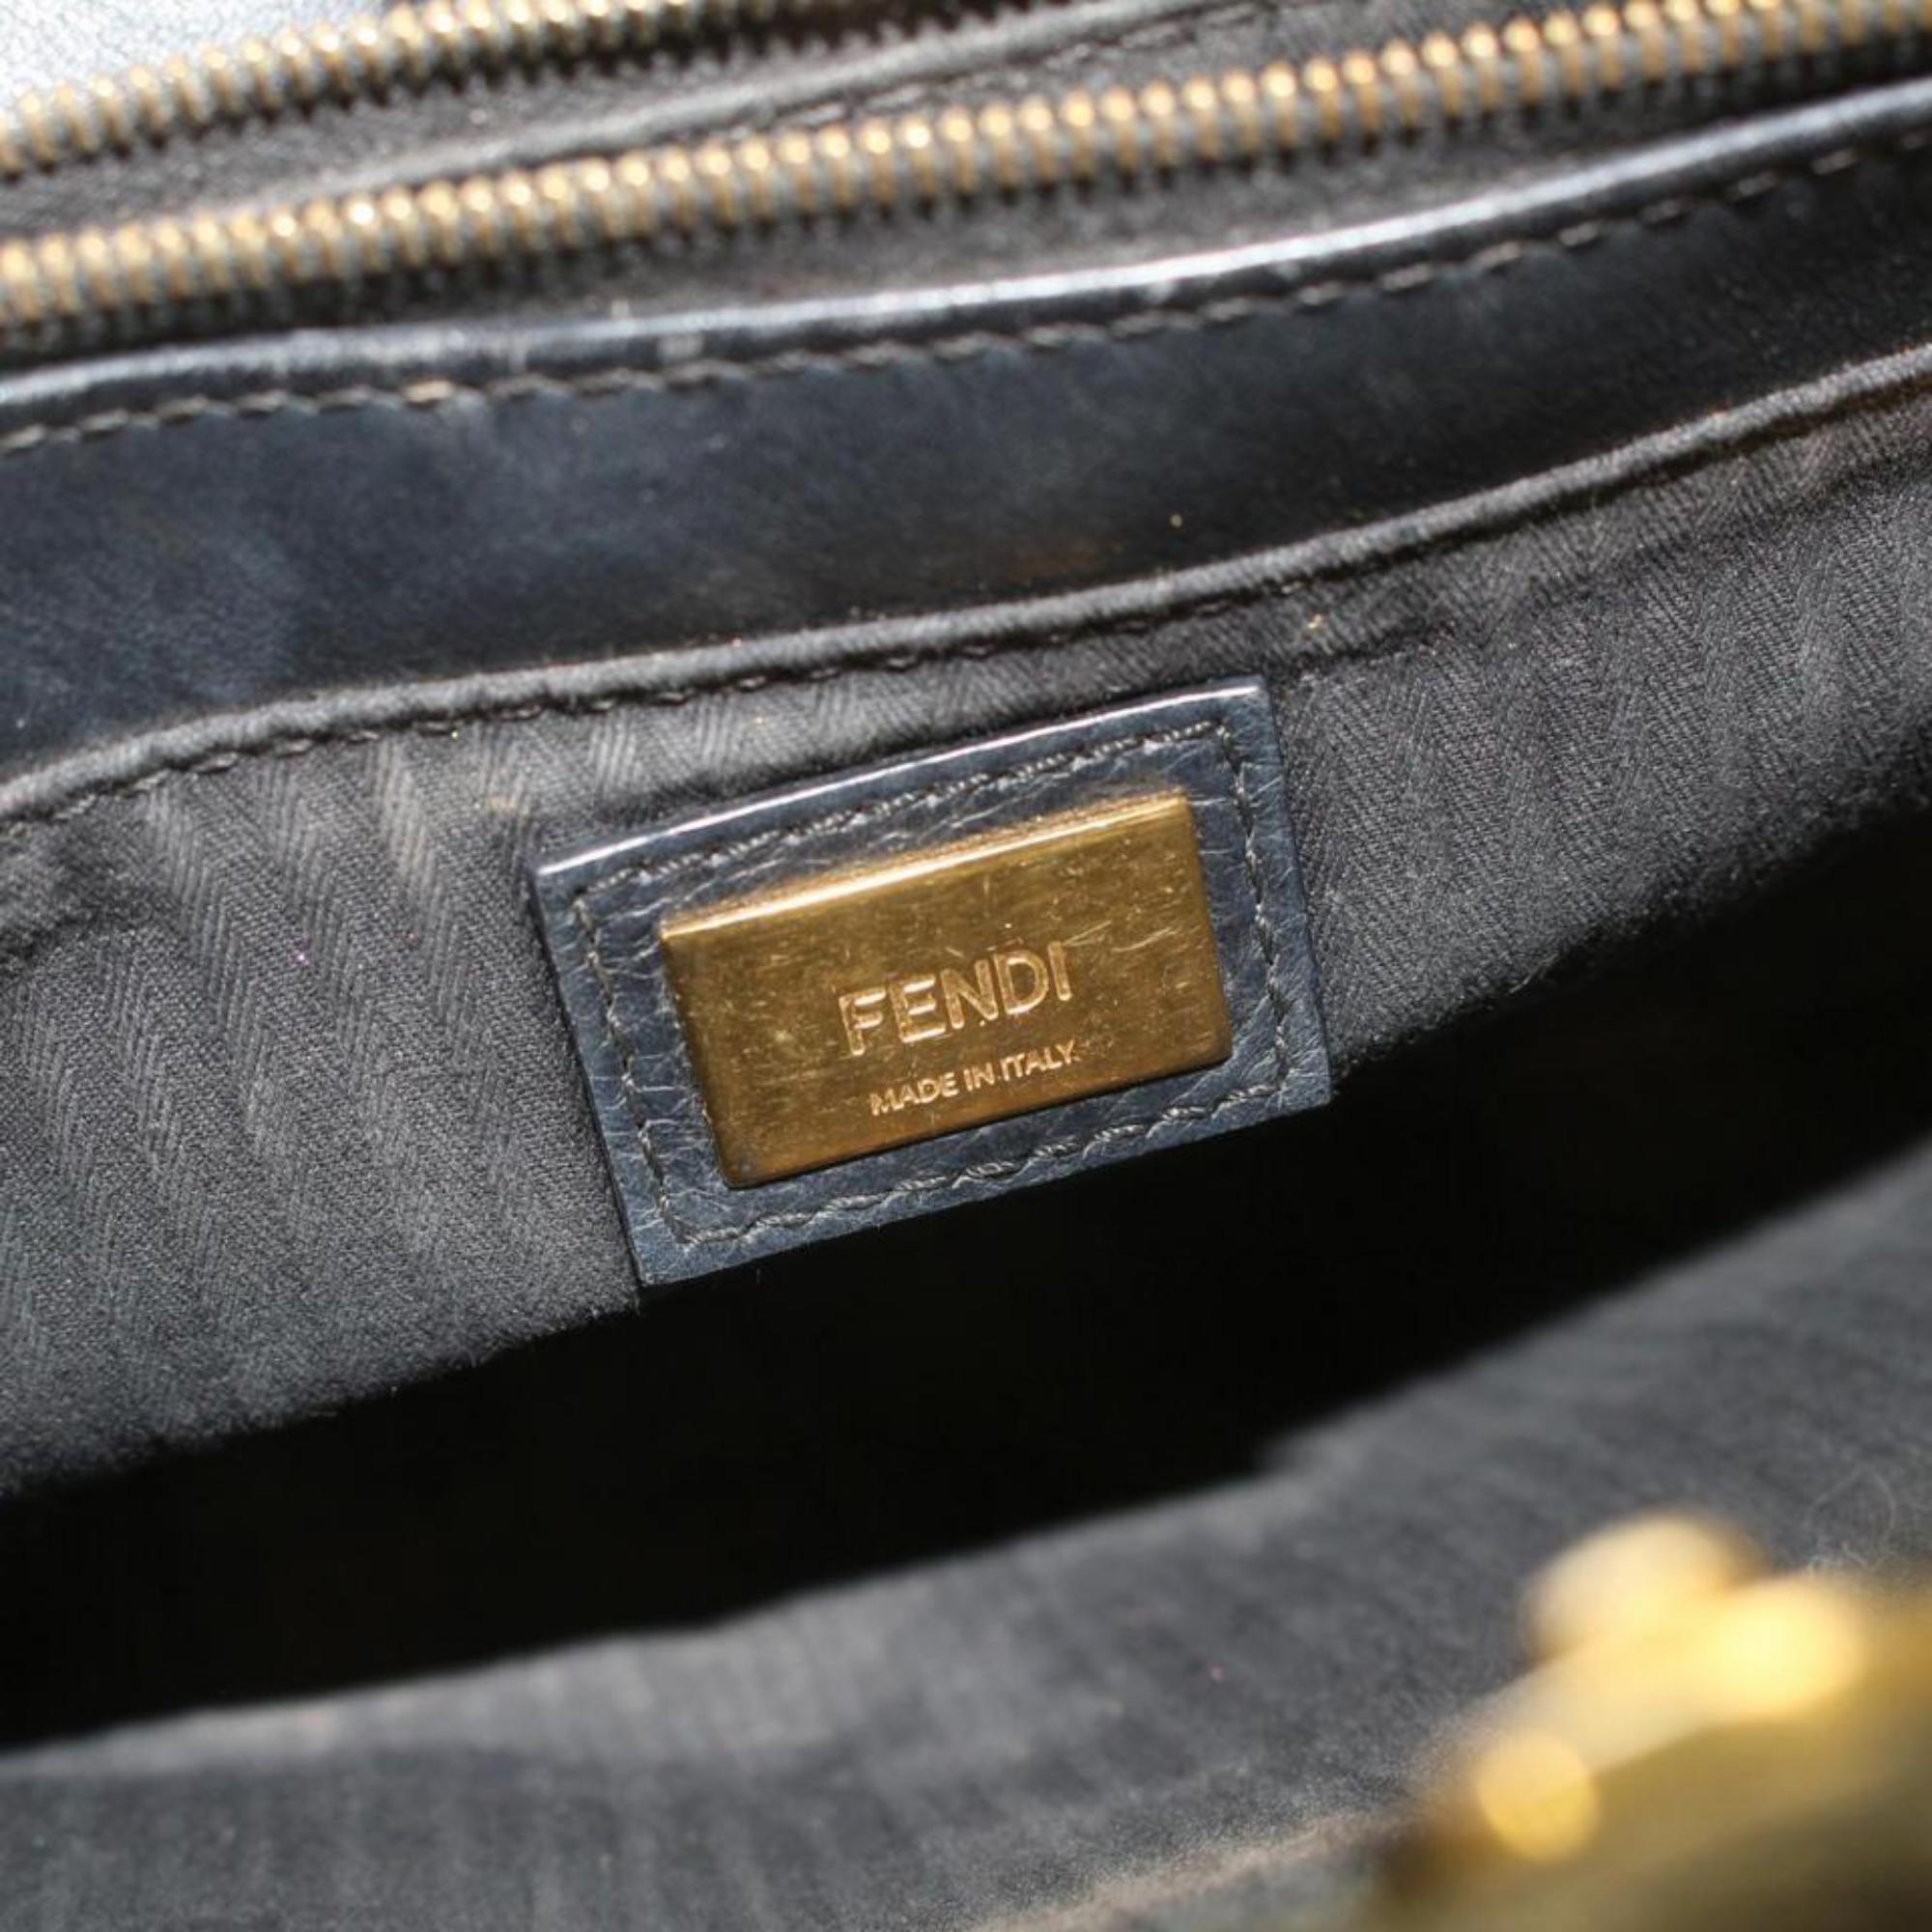 1de277610b2b Fendi Petite 2jours 2way Tote 869621 Black Leather Shoulder Bag For Sale at  1stdibs